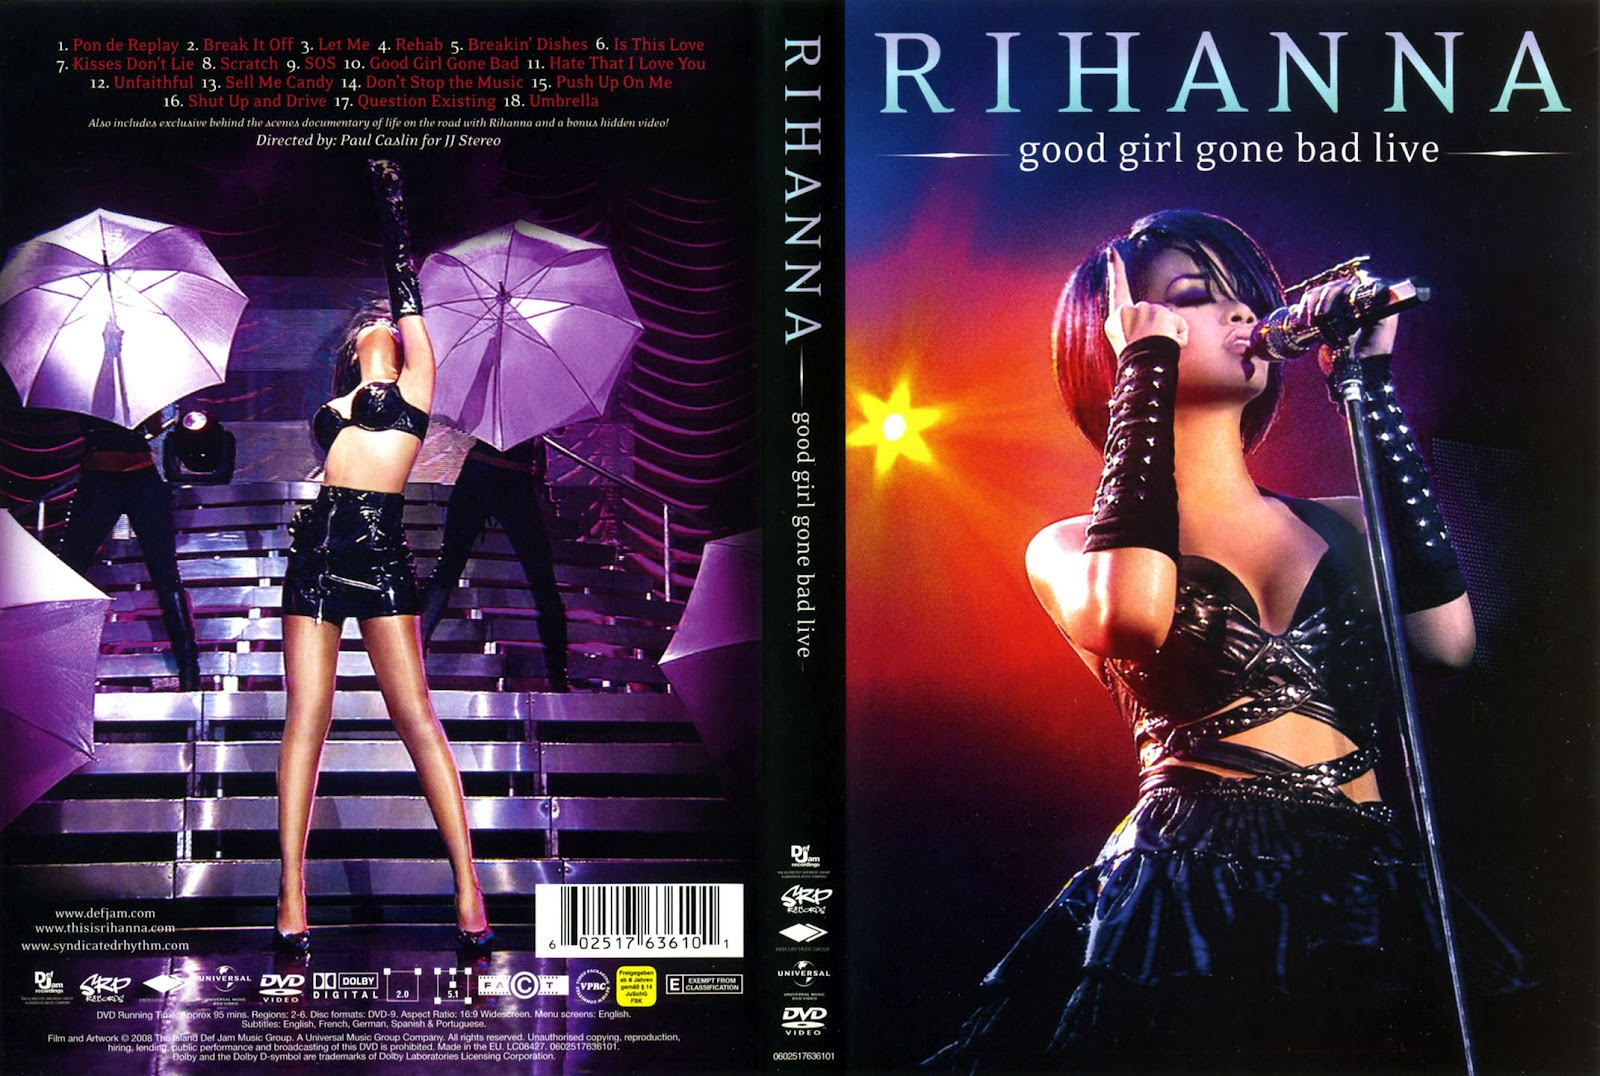 http://4.bp.blogspot.com/-YjQYv7uj6Ys/T8_oSnijhYI/AAAAAAAAA7U/fyA-fW6Jem0/s1600/Rihanna-Good_Girl_Gone_Bad_Live_%28DVD%29-Caratula.jpg